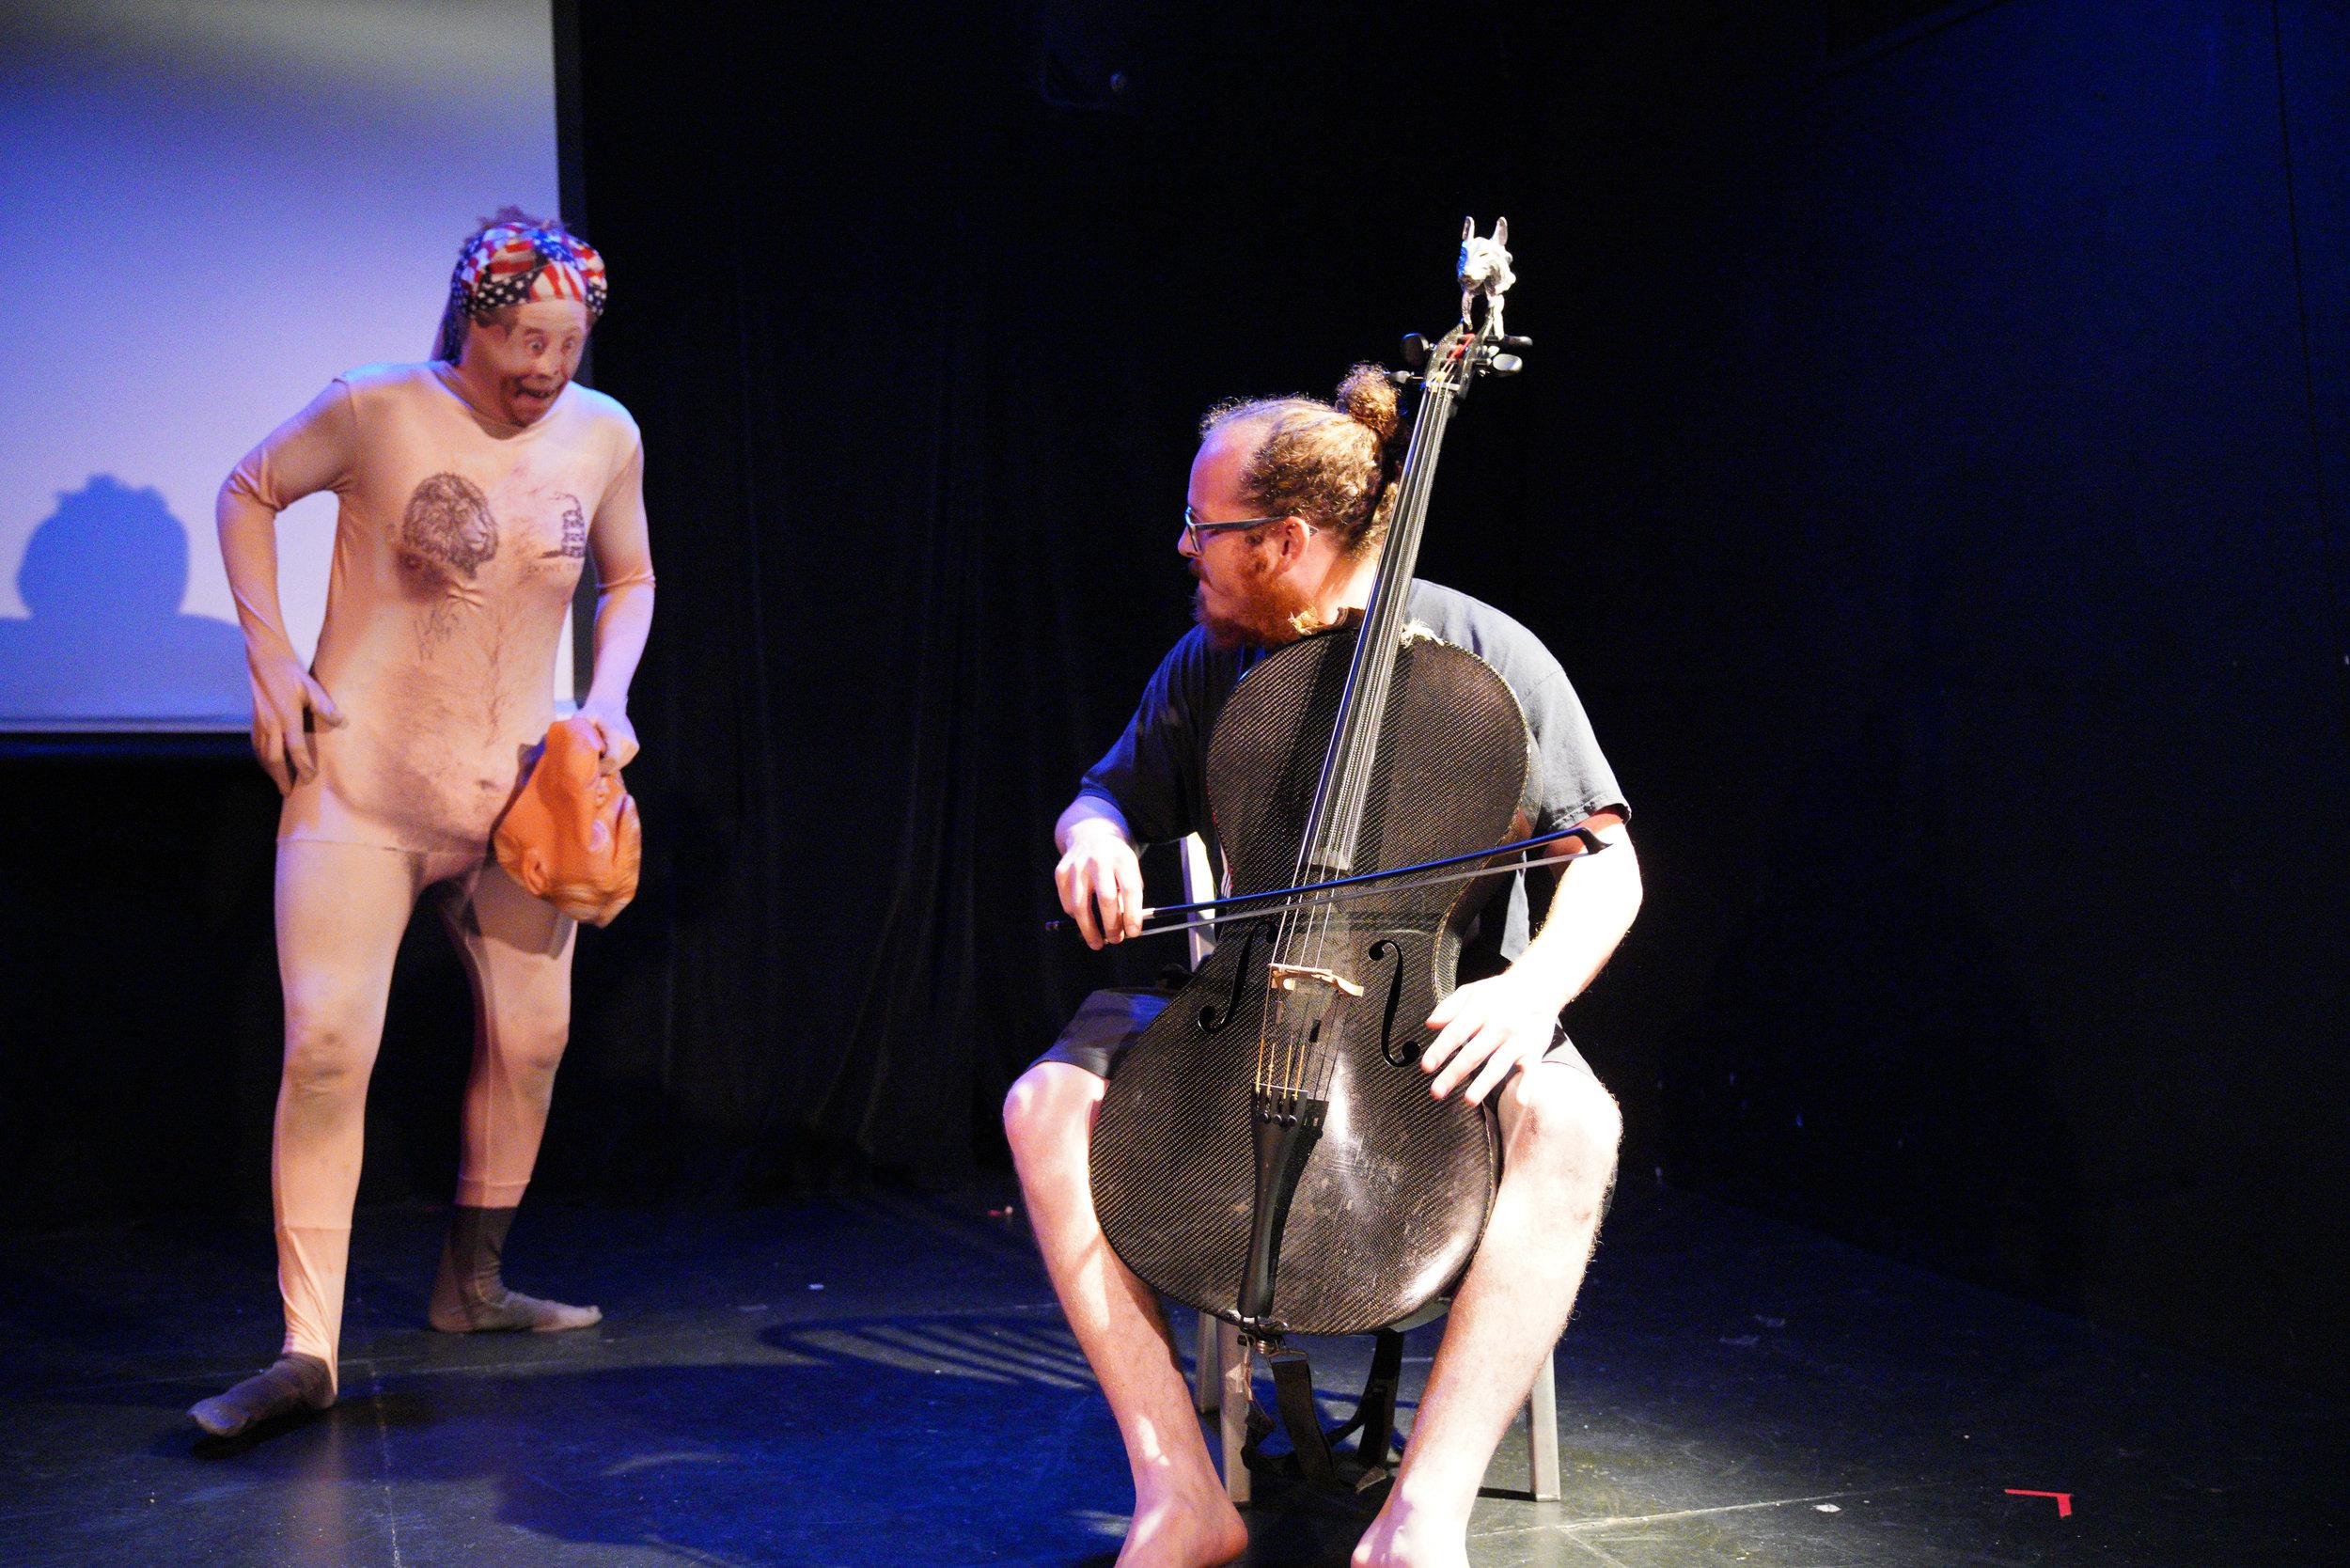 Cellist Jacob Cohen and performance artist Uniska Wahala Kano. Photo by Steven Pisano